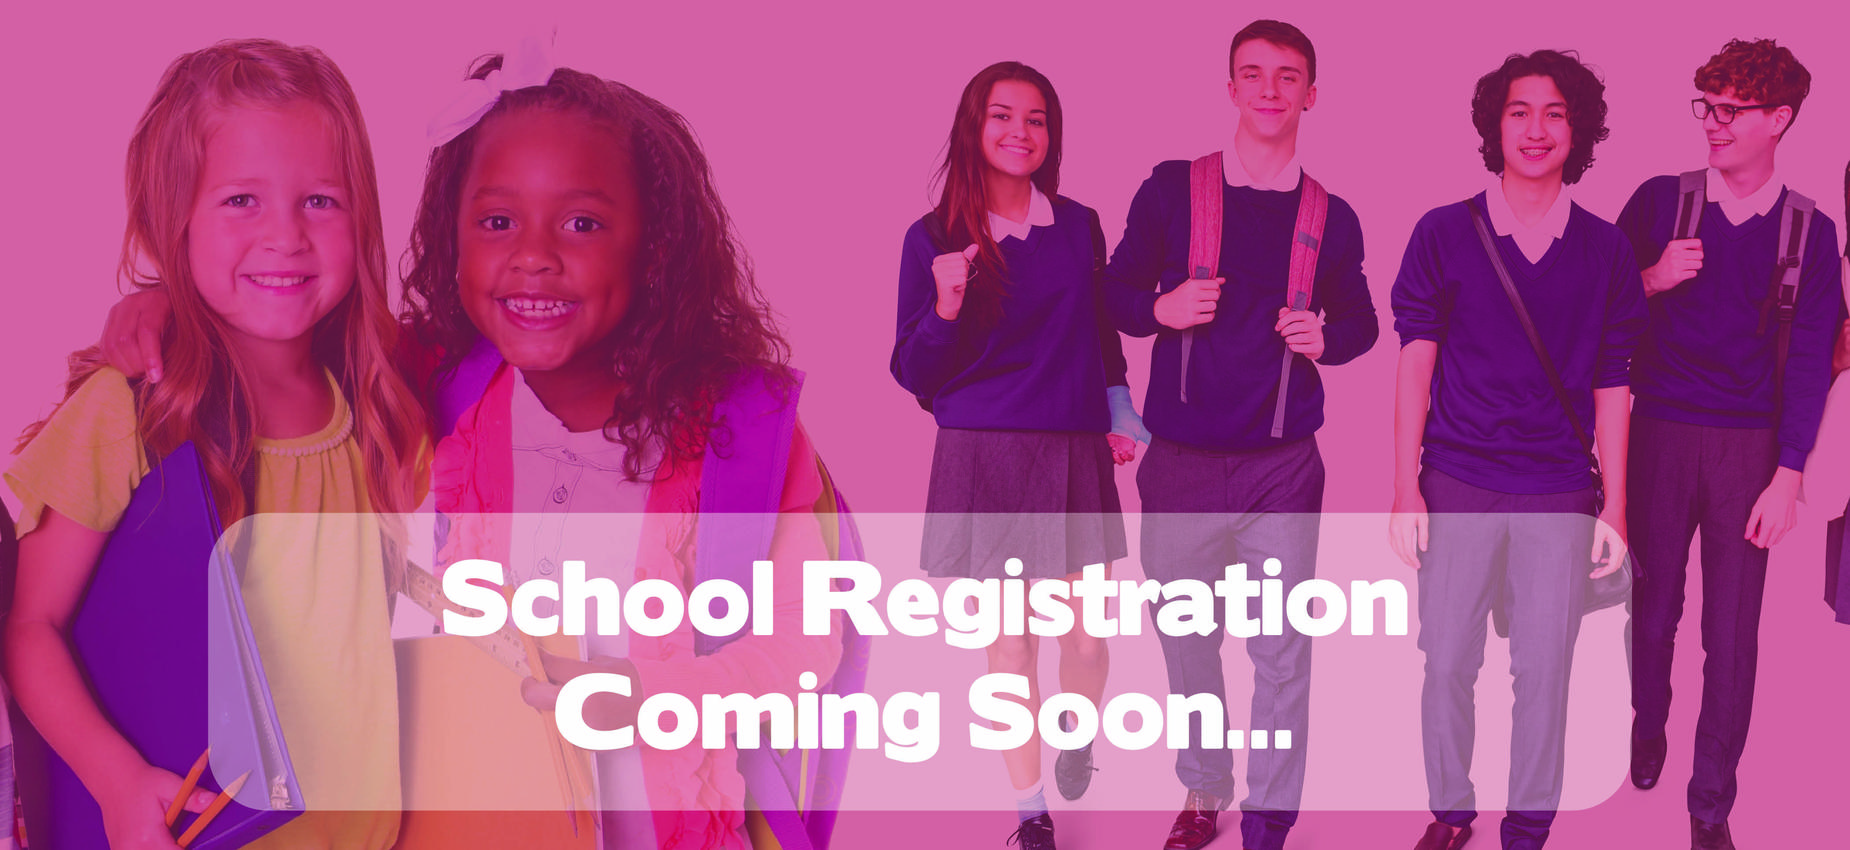 School Registration Coming Soon